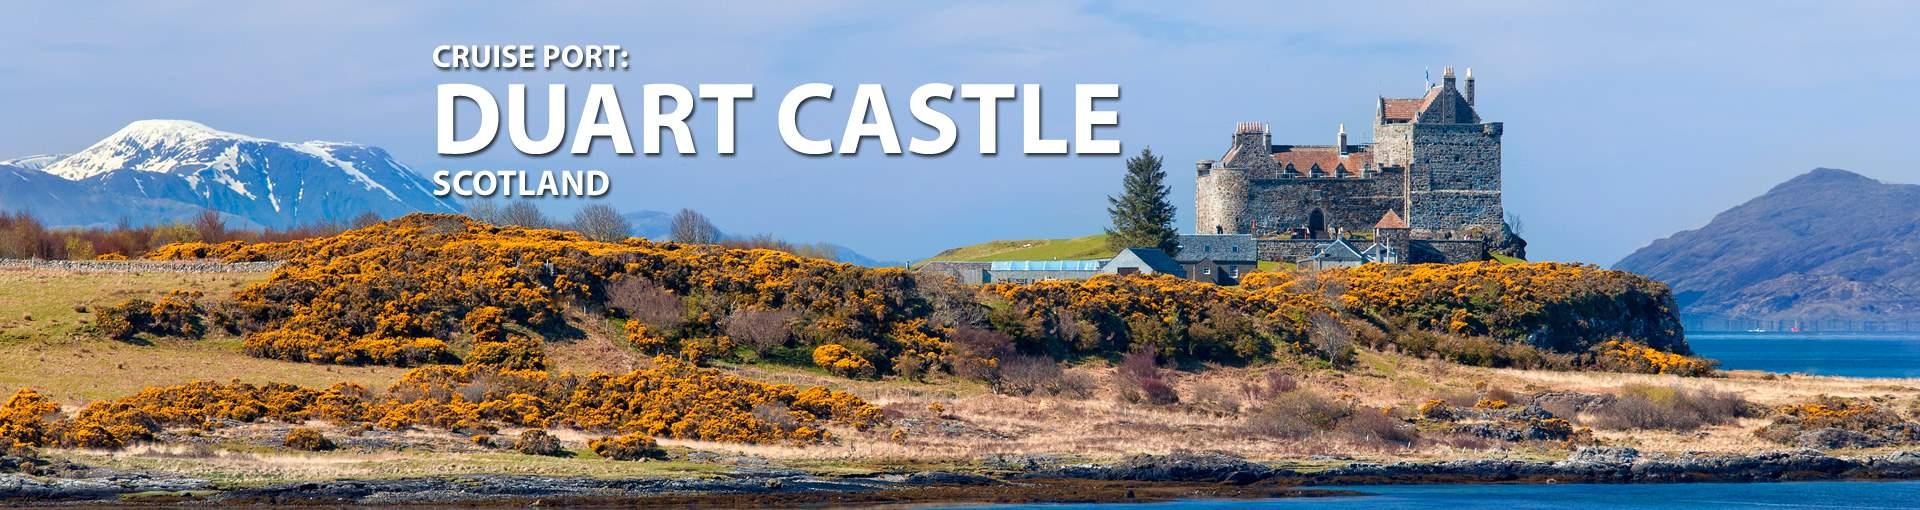 Cruises to Duart Castle, Scotland